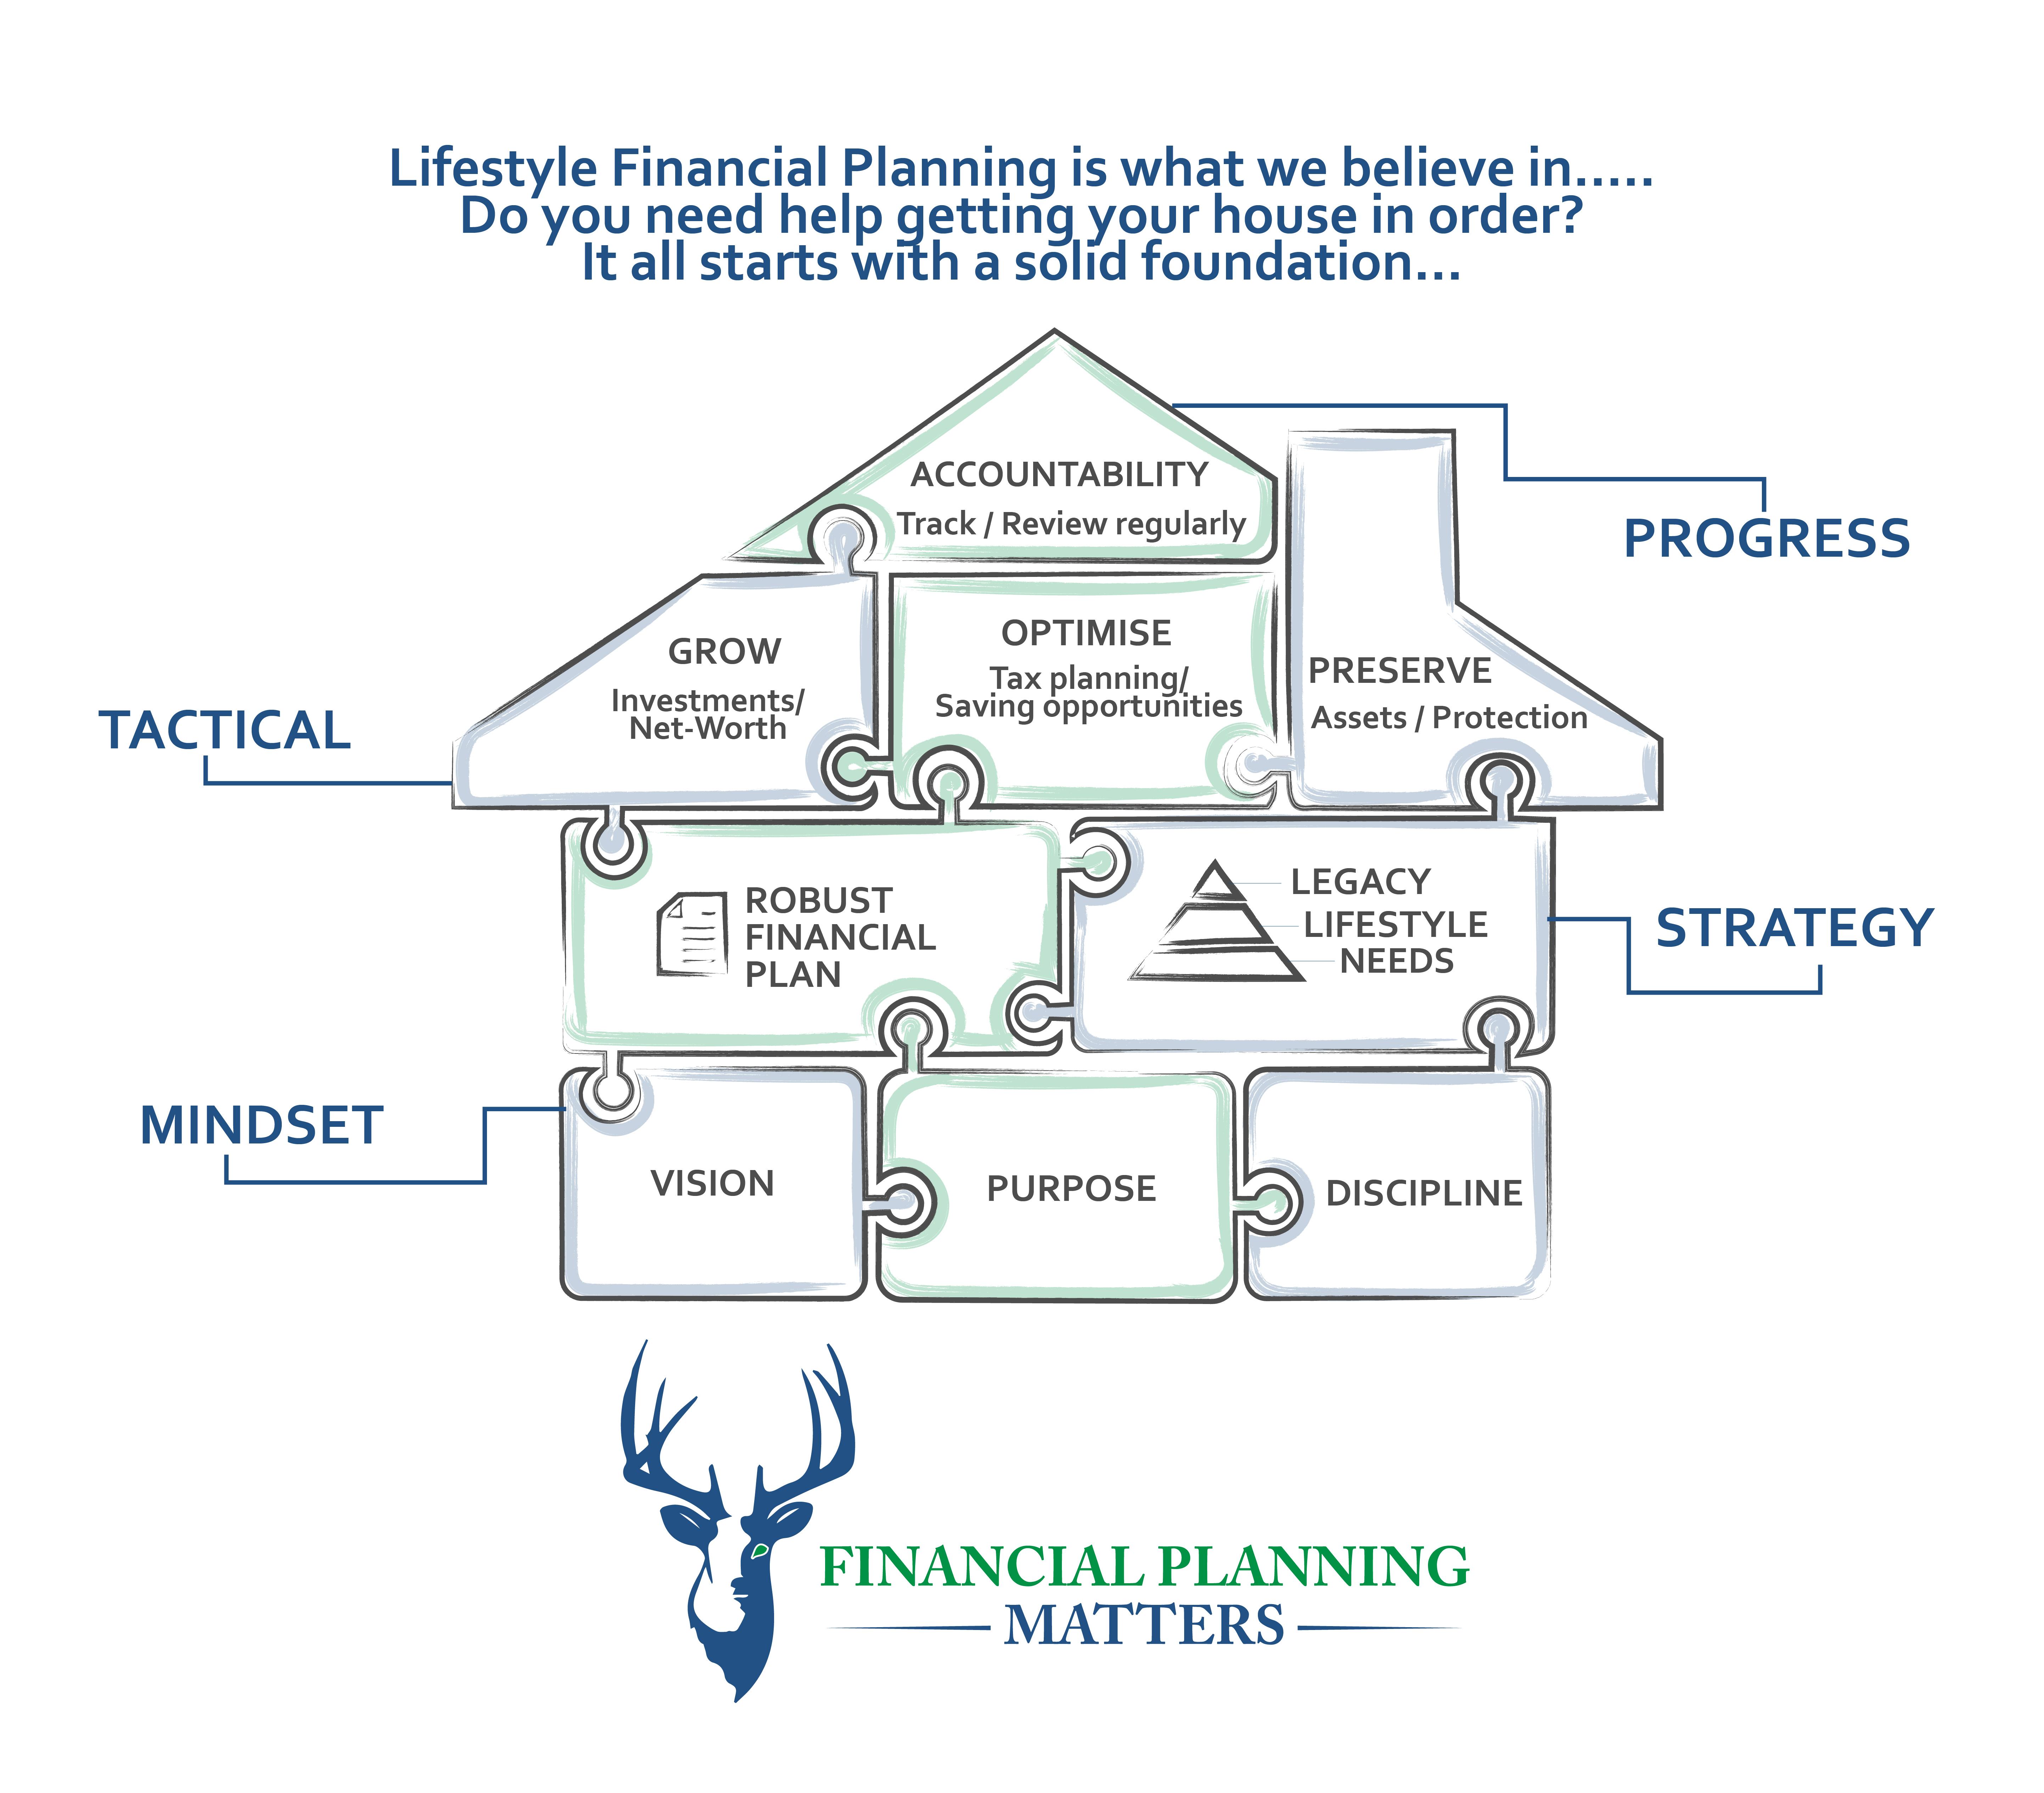 Financial Planning Matters infographic Dublin, Ireland Financial Planning Matters